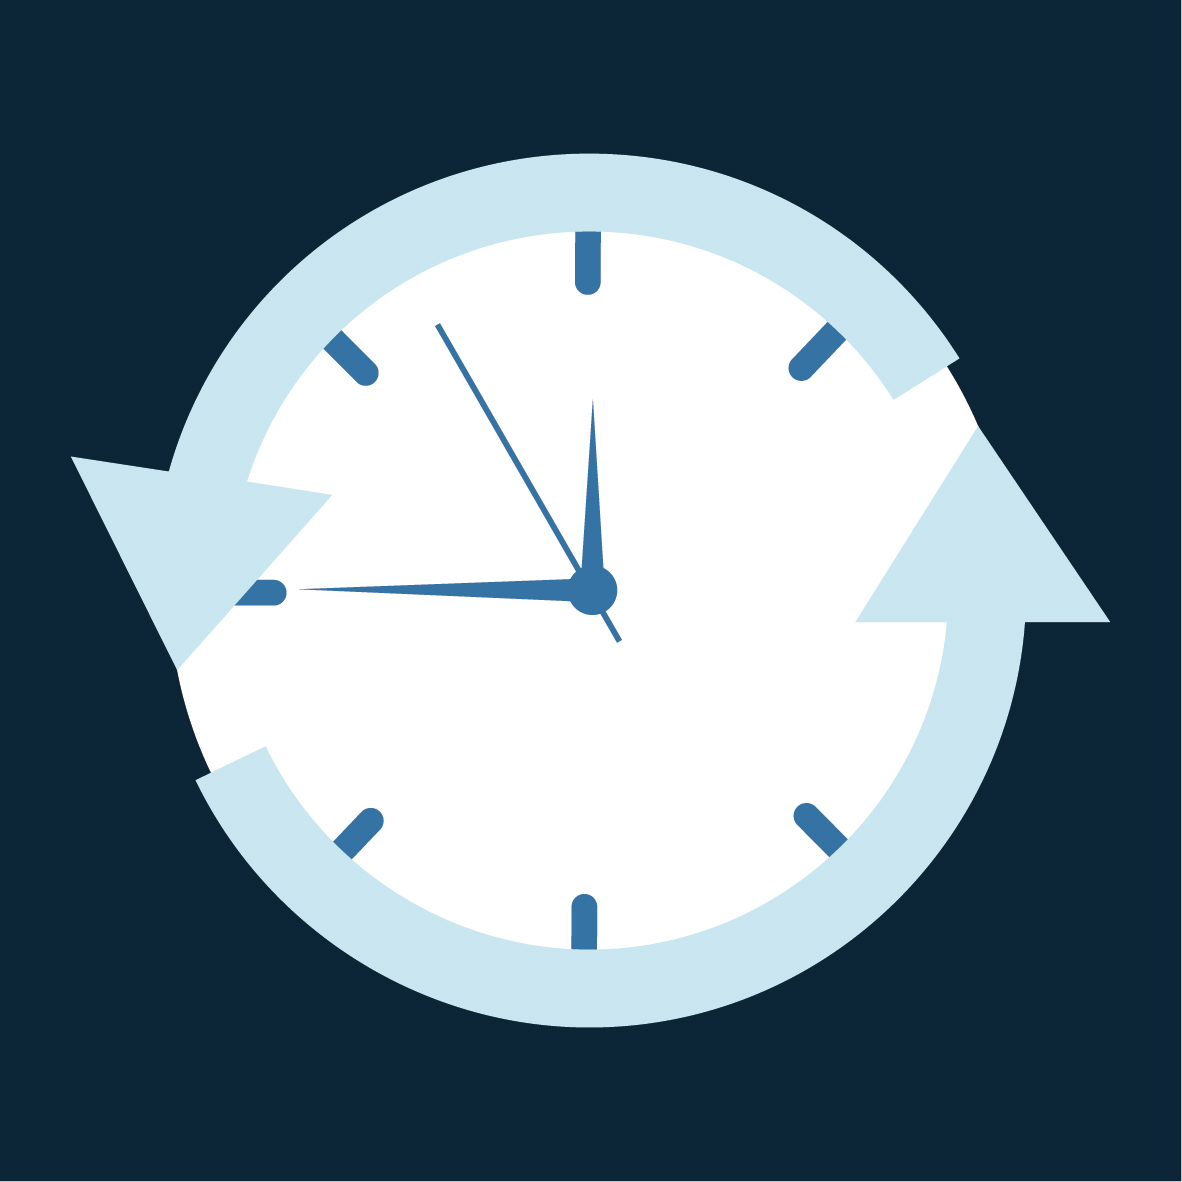 Flexible work schedule models (Image © NeuroCheck)